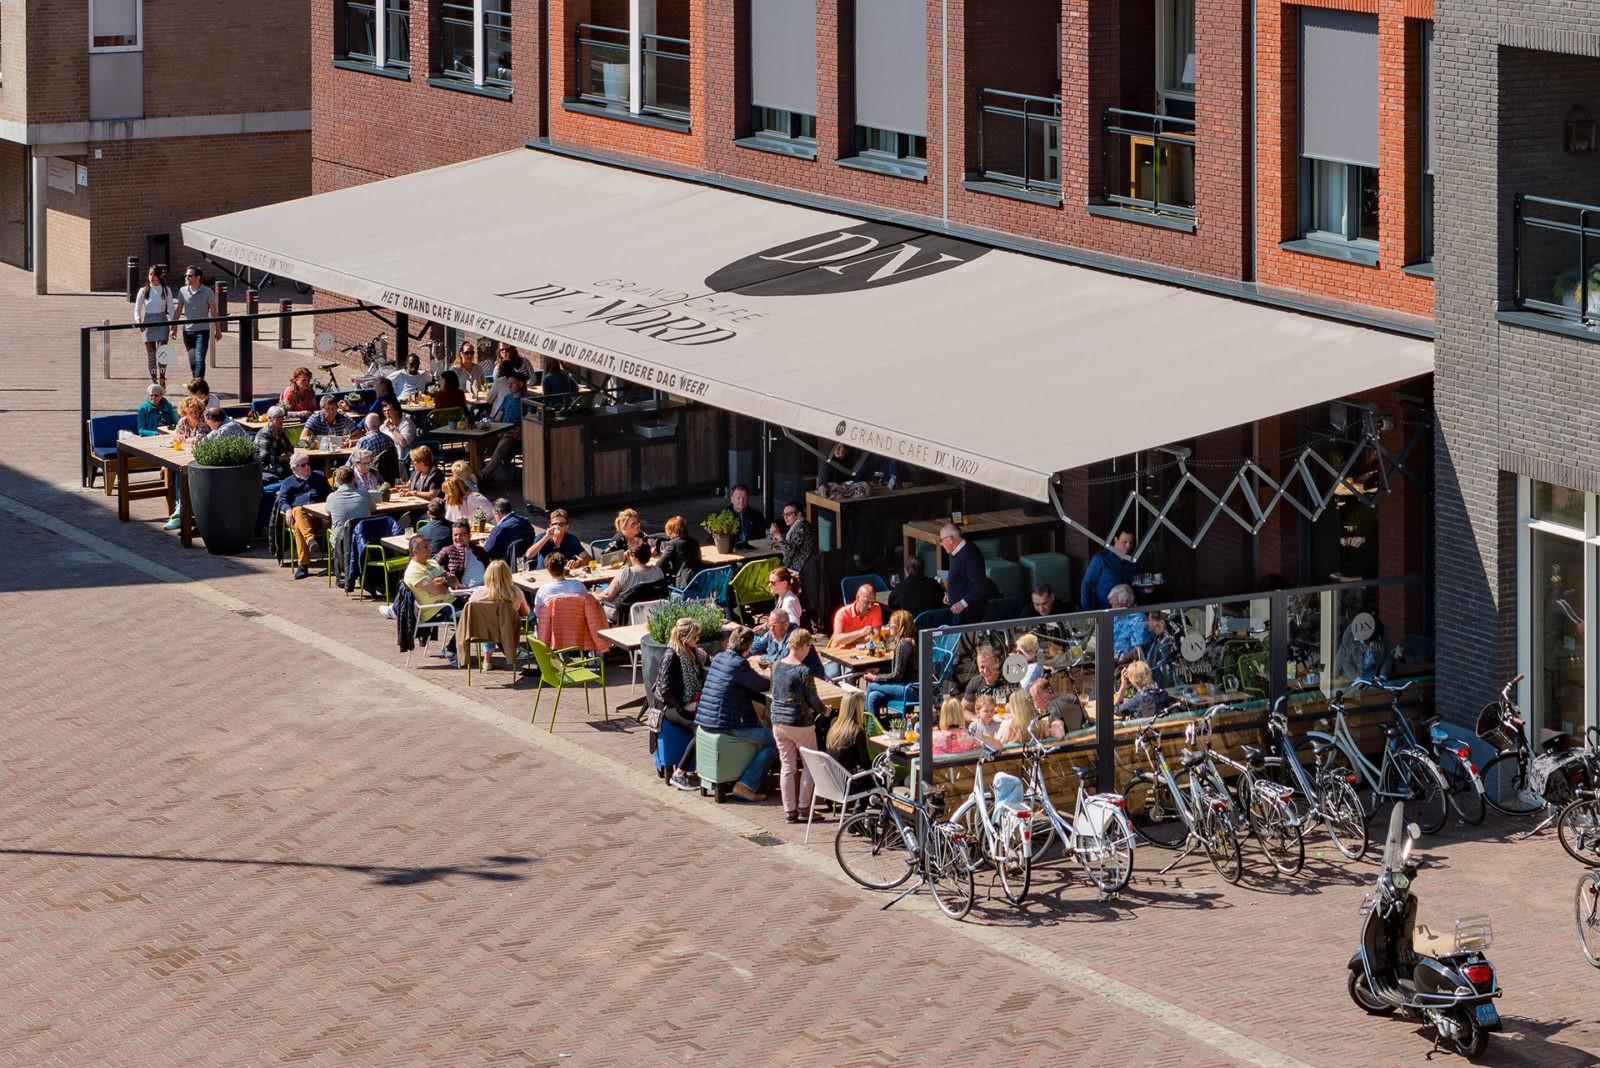 Grand Cafe Du Nord Kaatsheuvel terras